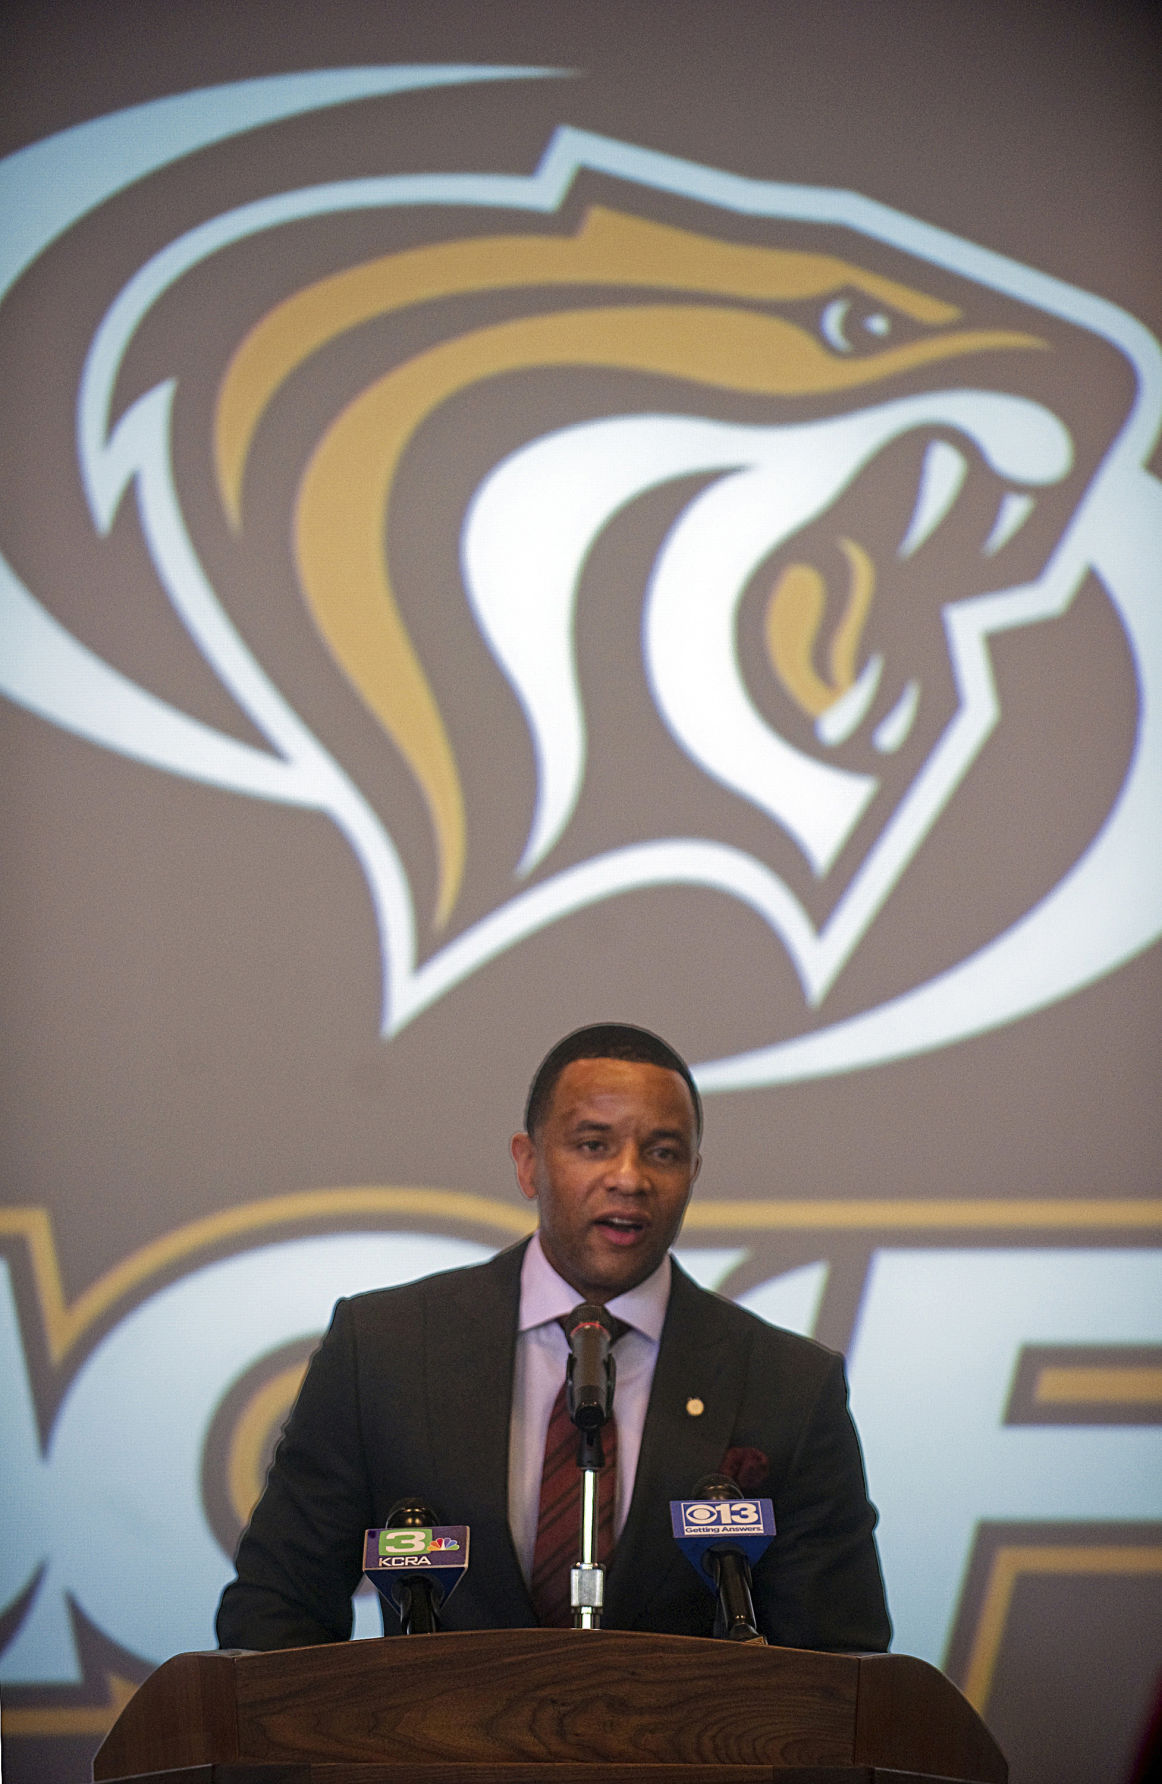 Arizona Wildcats legend Damon Stoudamire accepts University of the